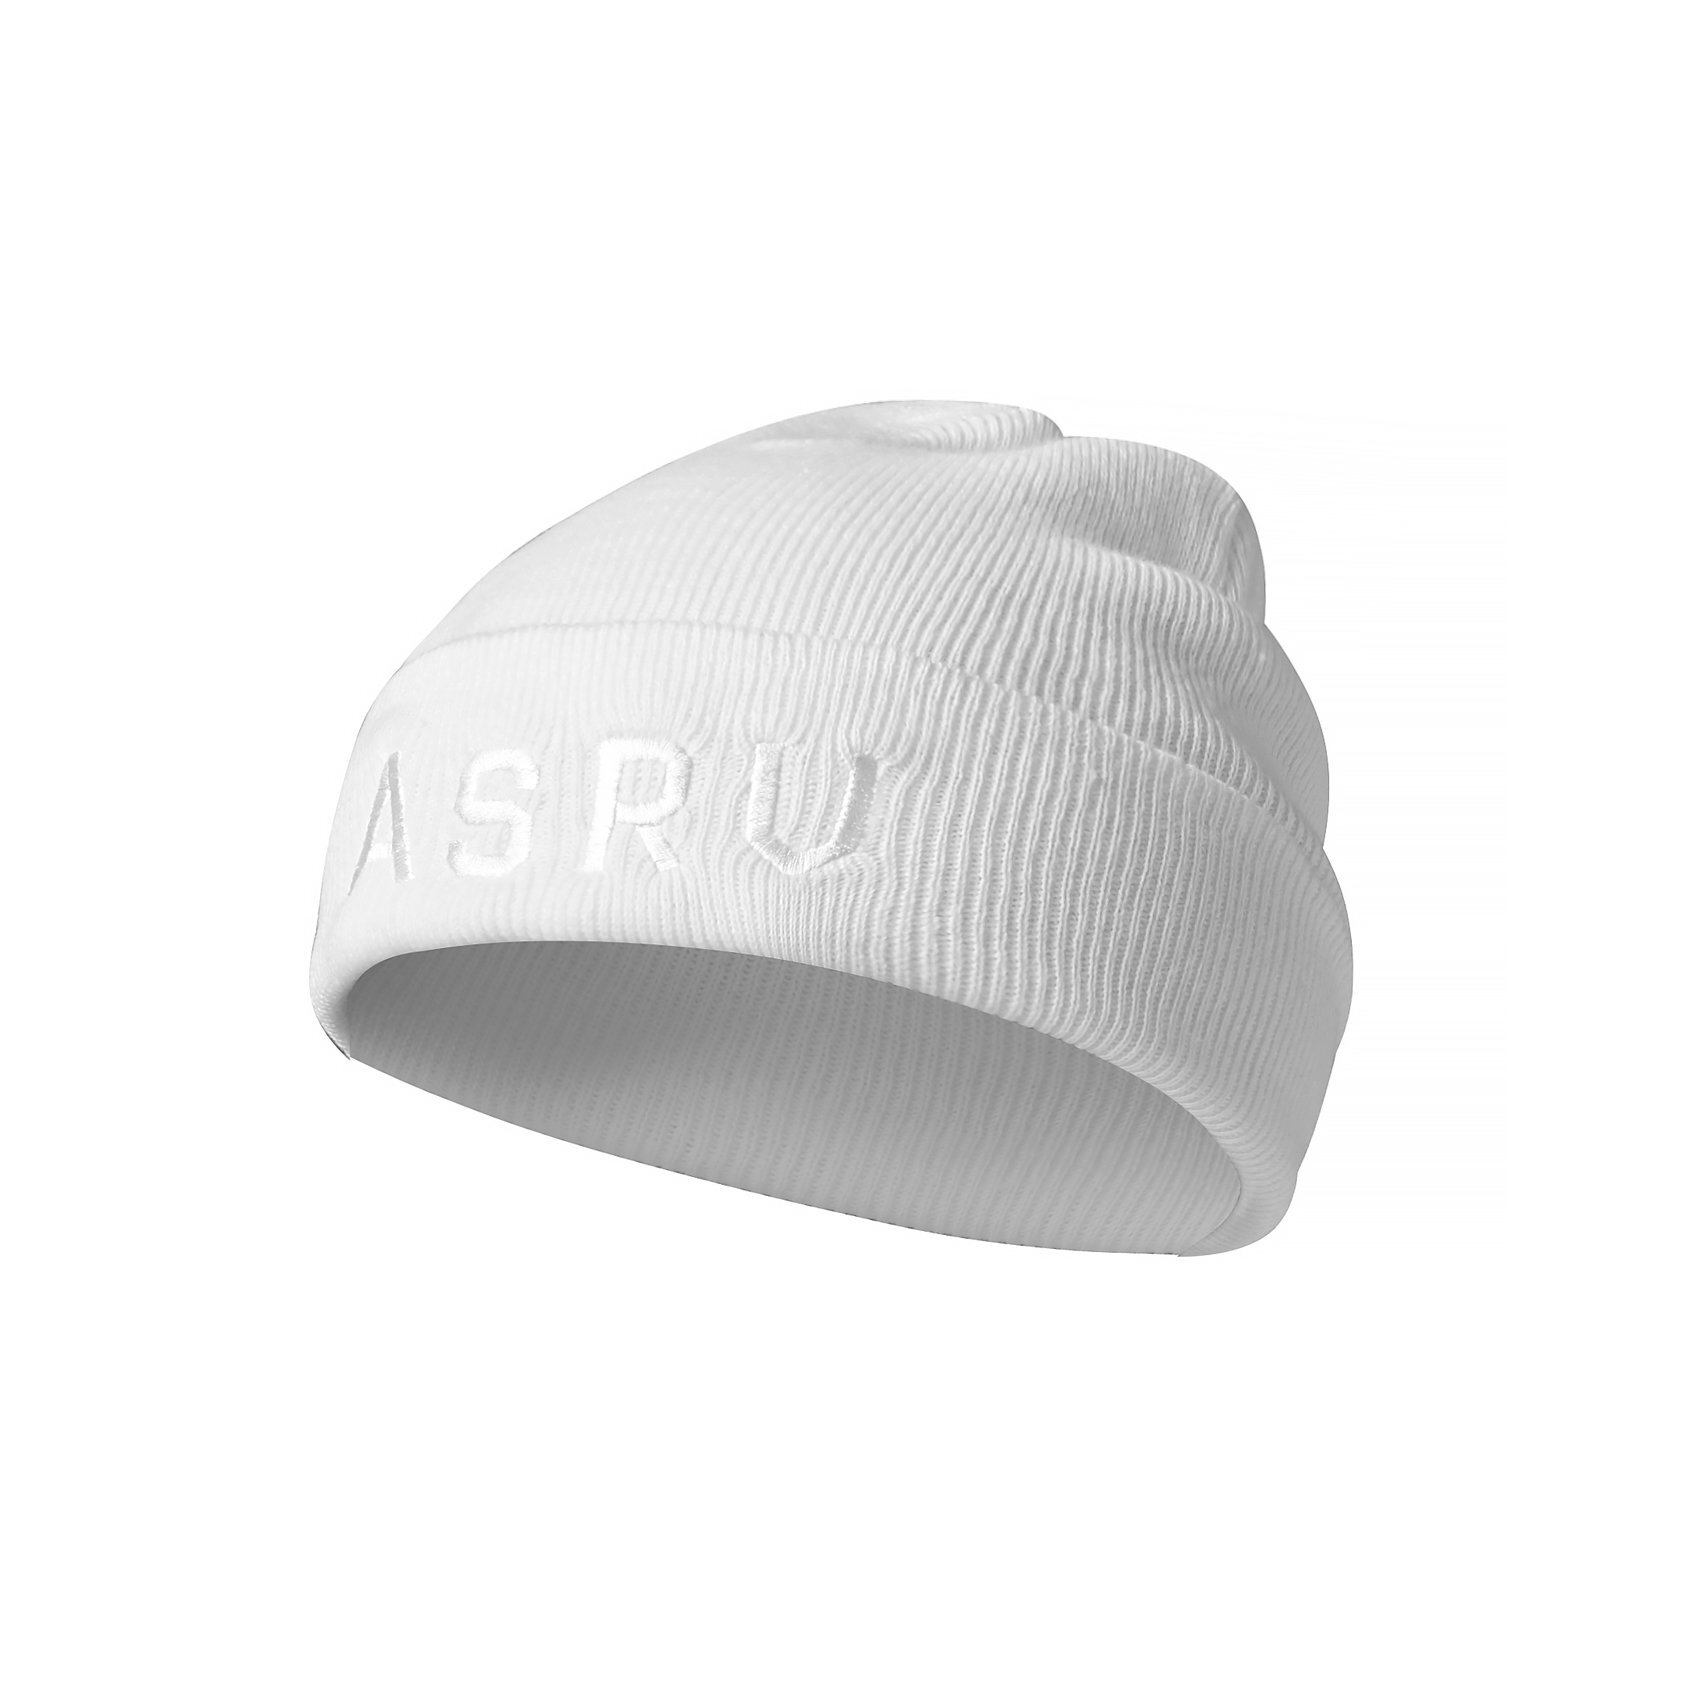 【ASRV】サーマルウールキャップ - White